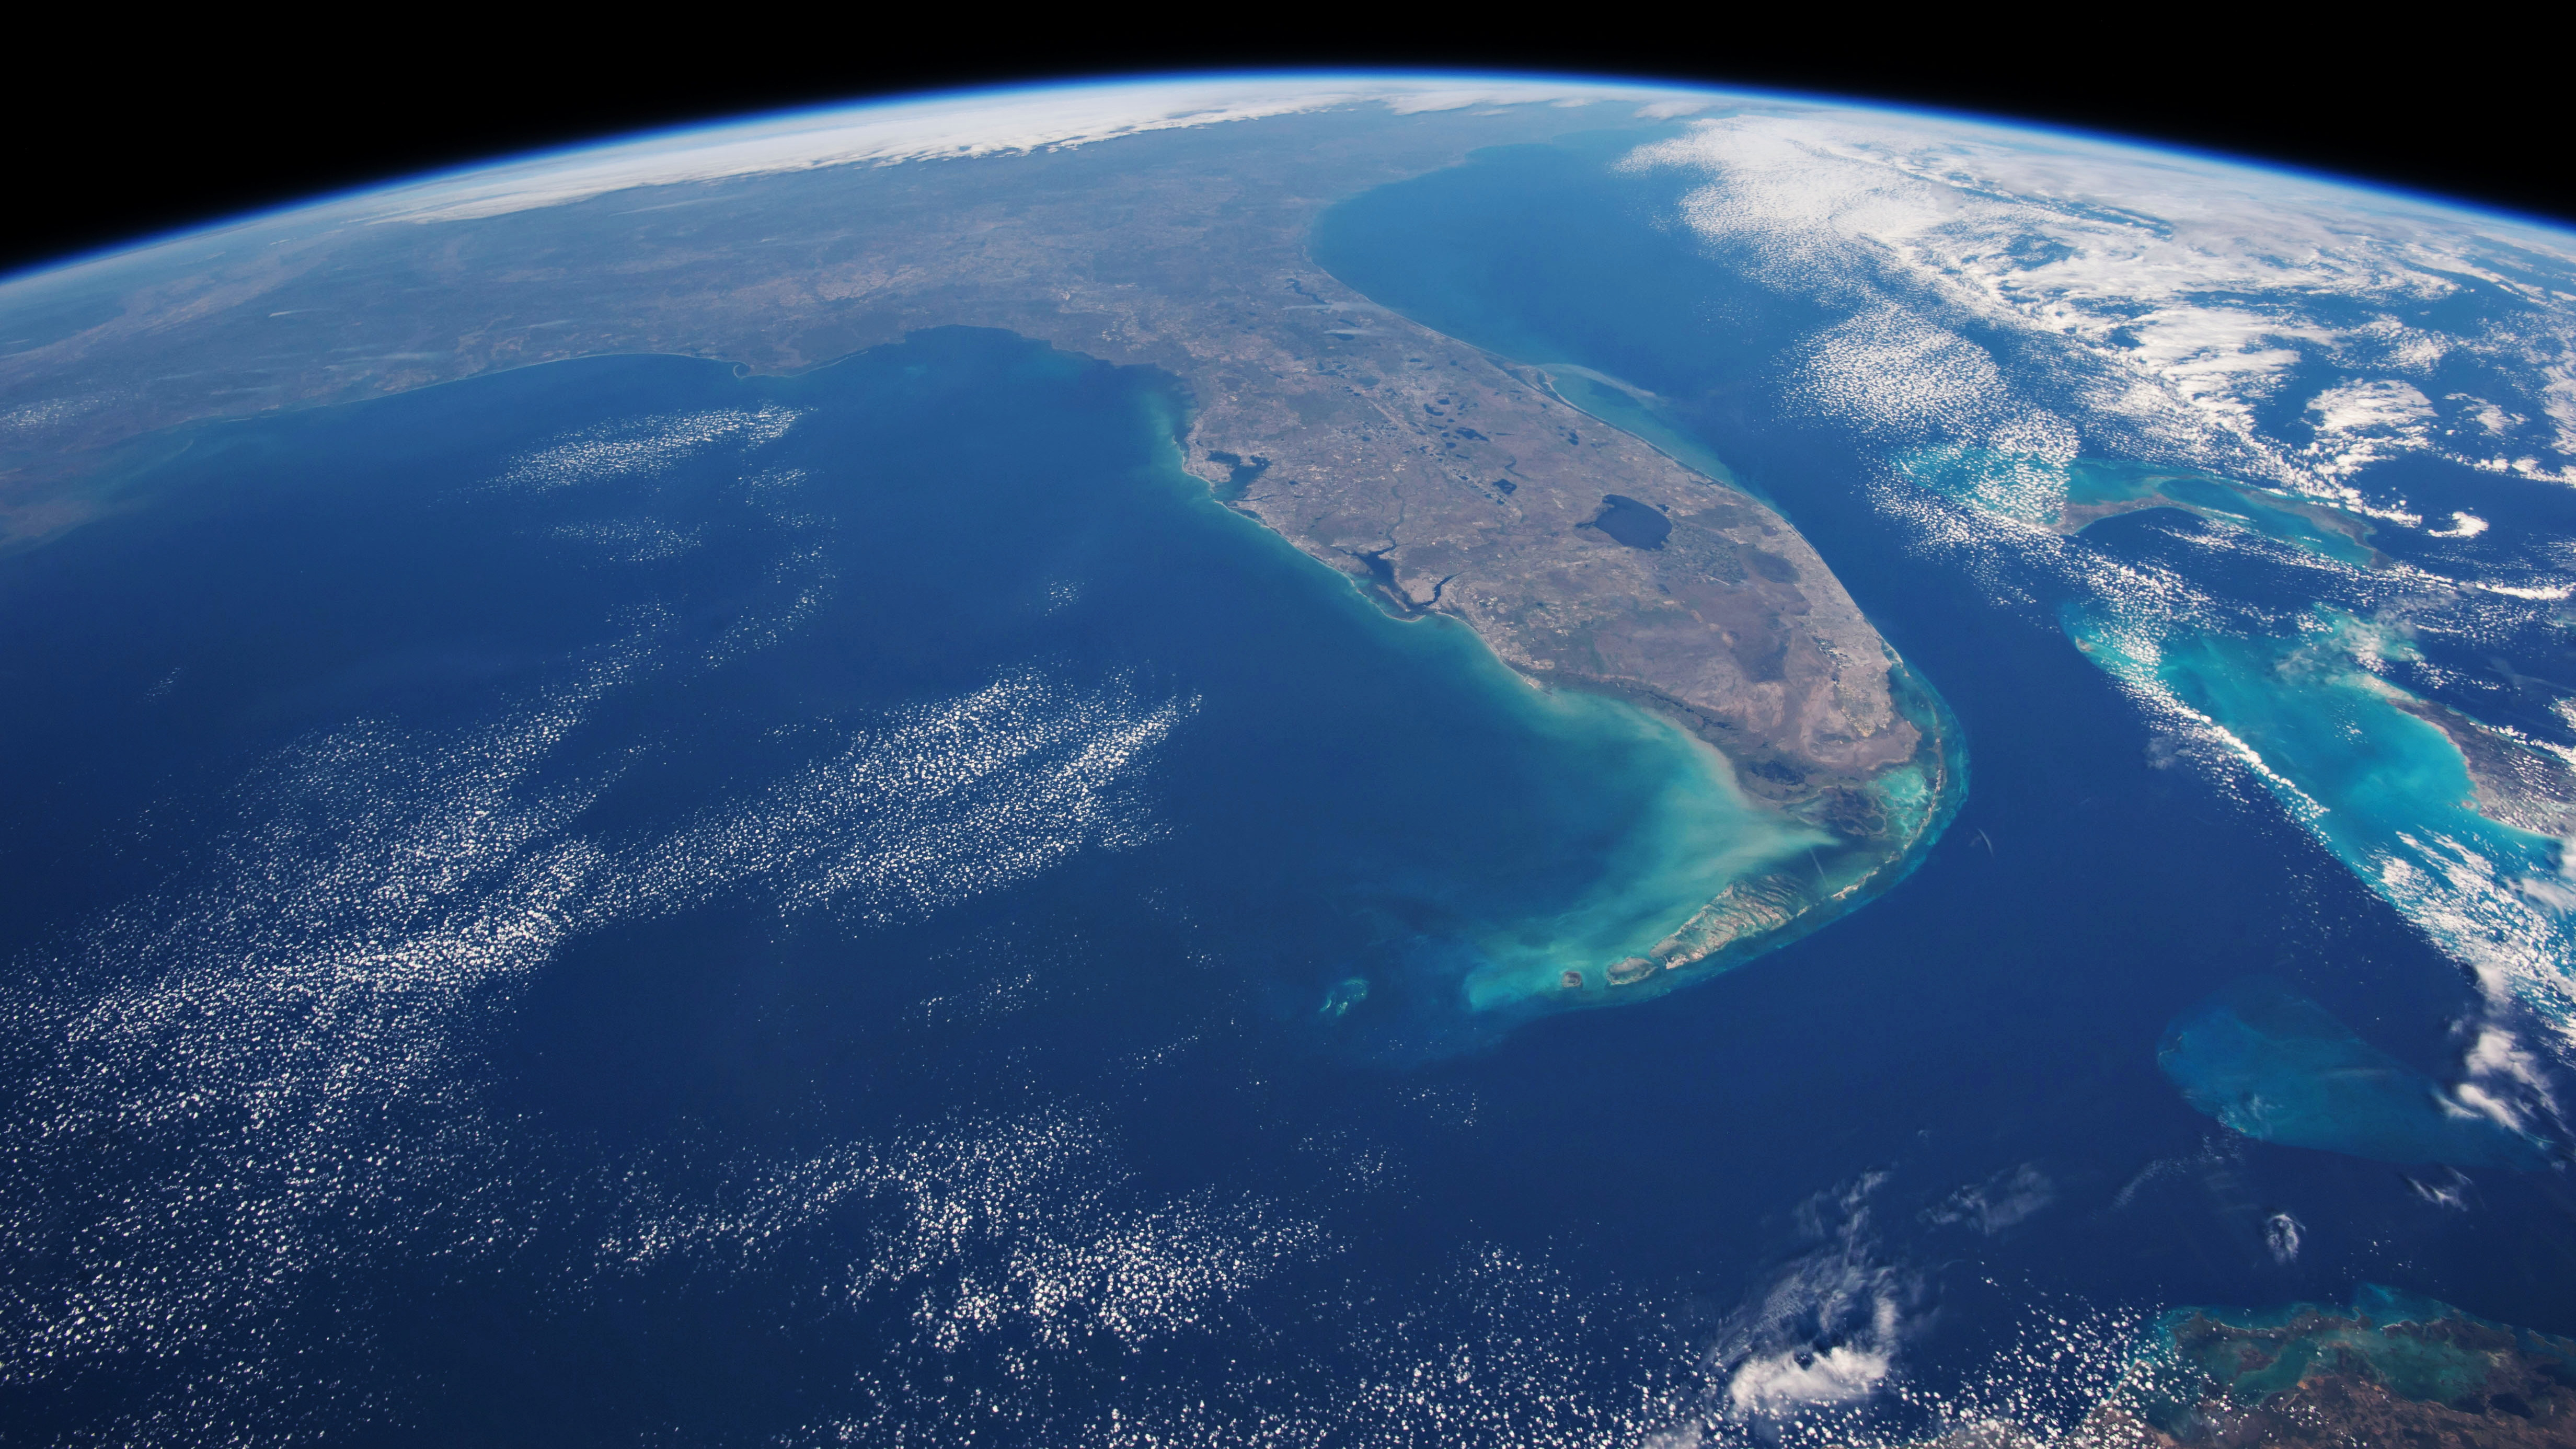 Florida from Space HD Wallpaper Wide Screen Wallpaper 1080p2K4K 4928x2772